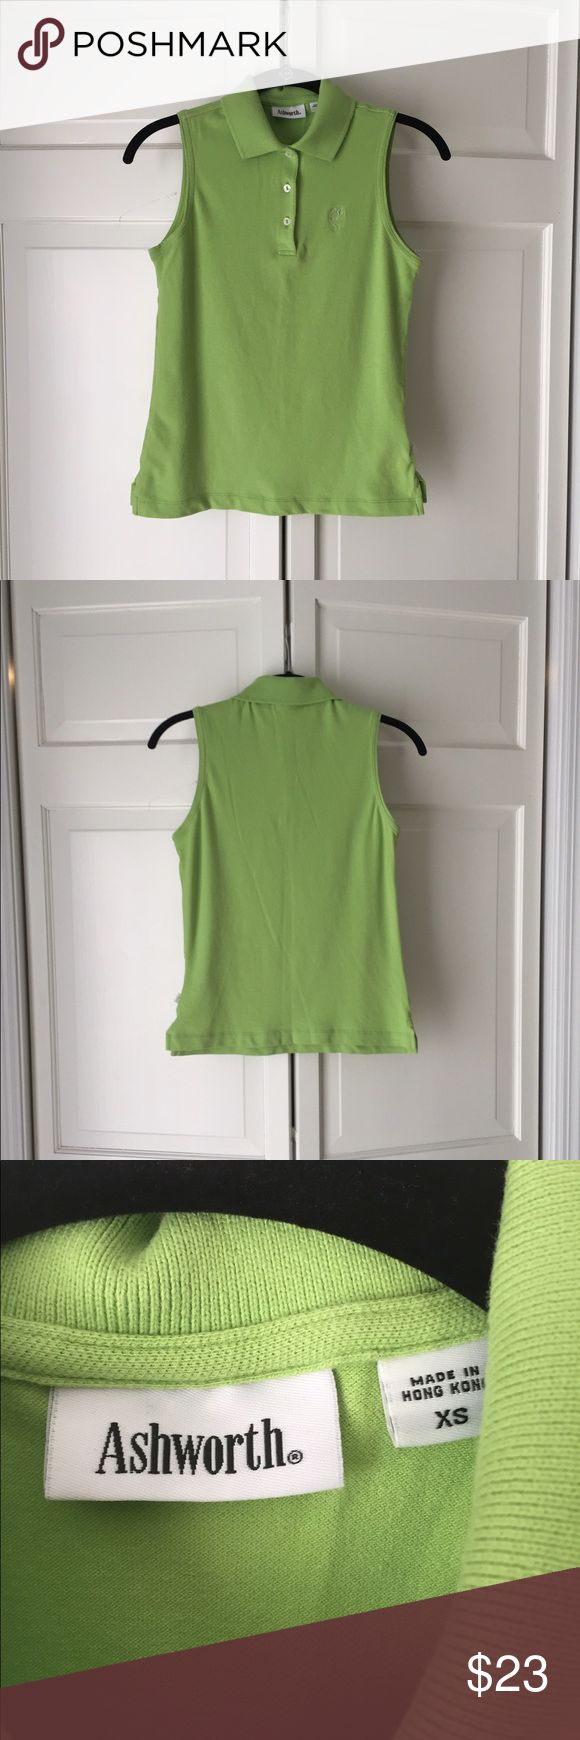 Ashworth Women's Golf Shirt Worn once.  Like new Ashworth golf shirt.  Nice stretch material. Ashworth Tops Button Down Shirts